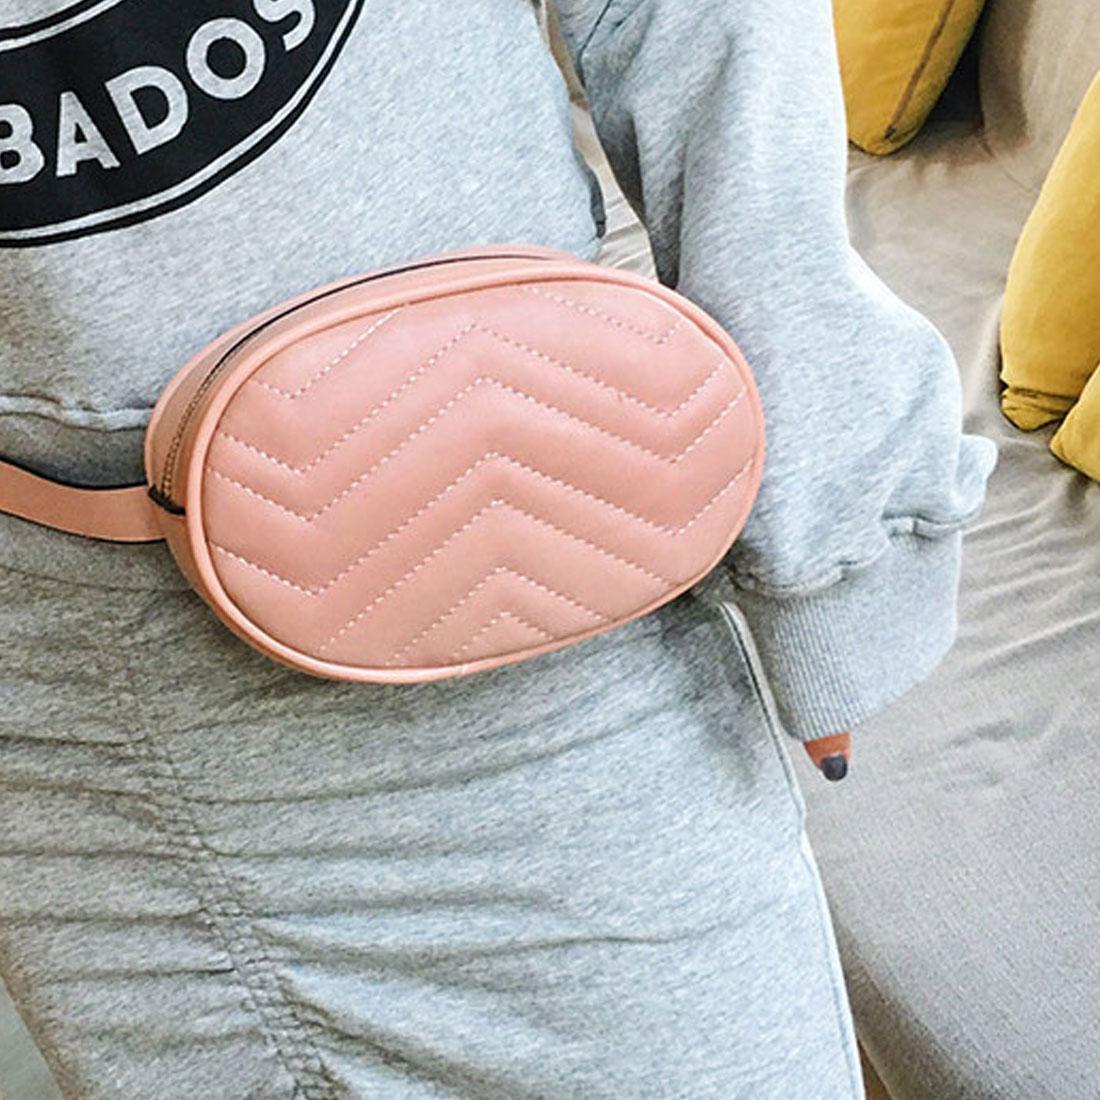 Fashion Women waist bag Pure Color Leather Messenger belt bags Chest Bag Crossbody Flap Versatile Chest Handbag Round Belt Bag in Waist Packs from Luggage Bags